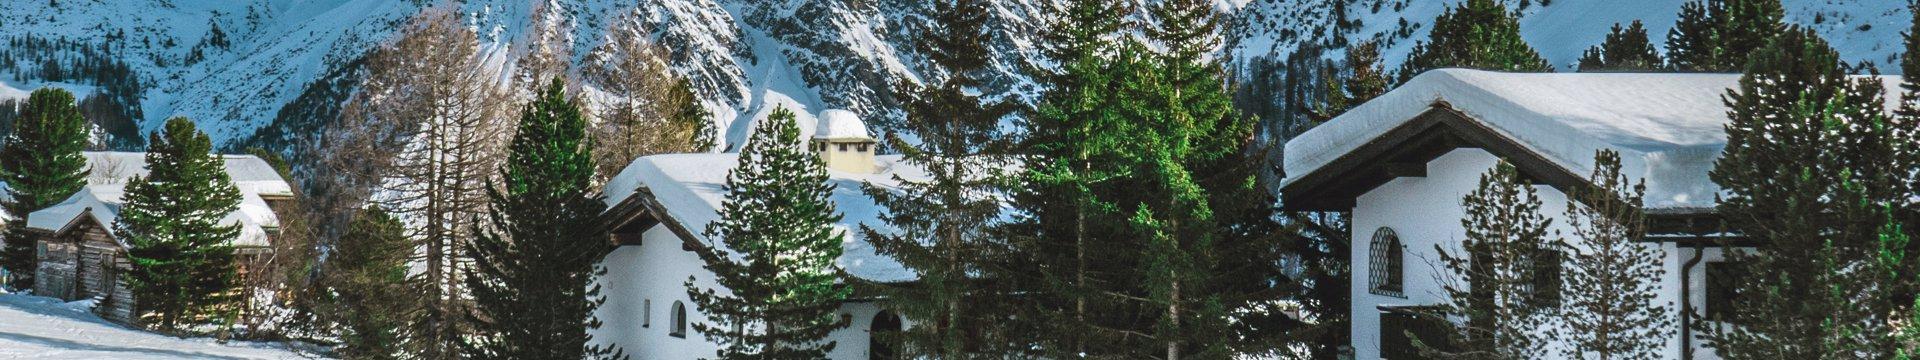 Skigebied Arosa